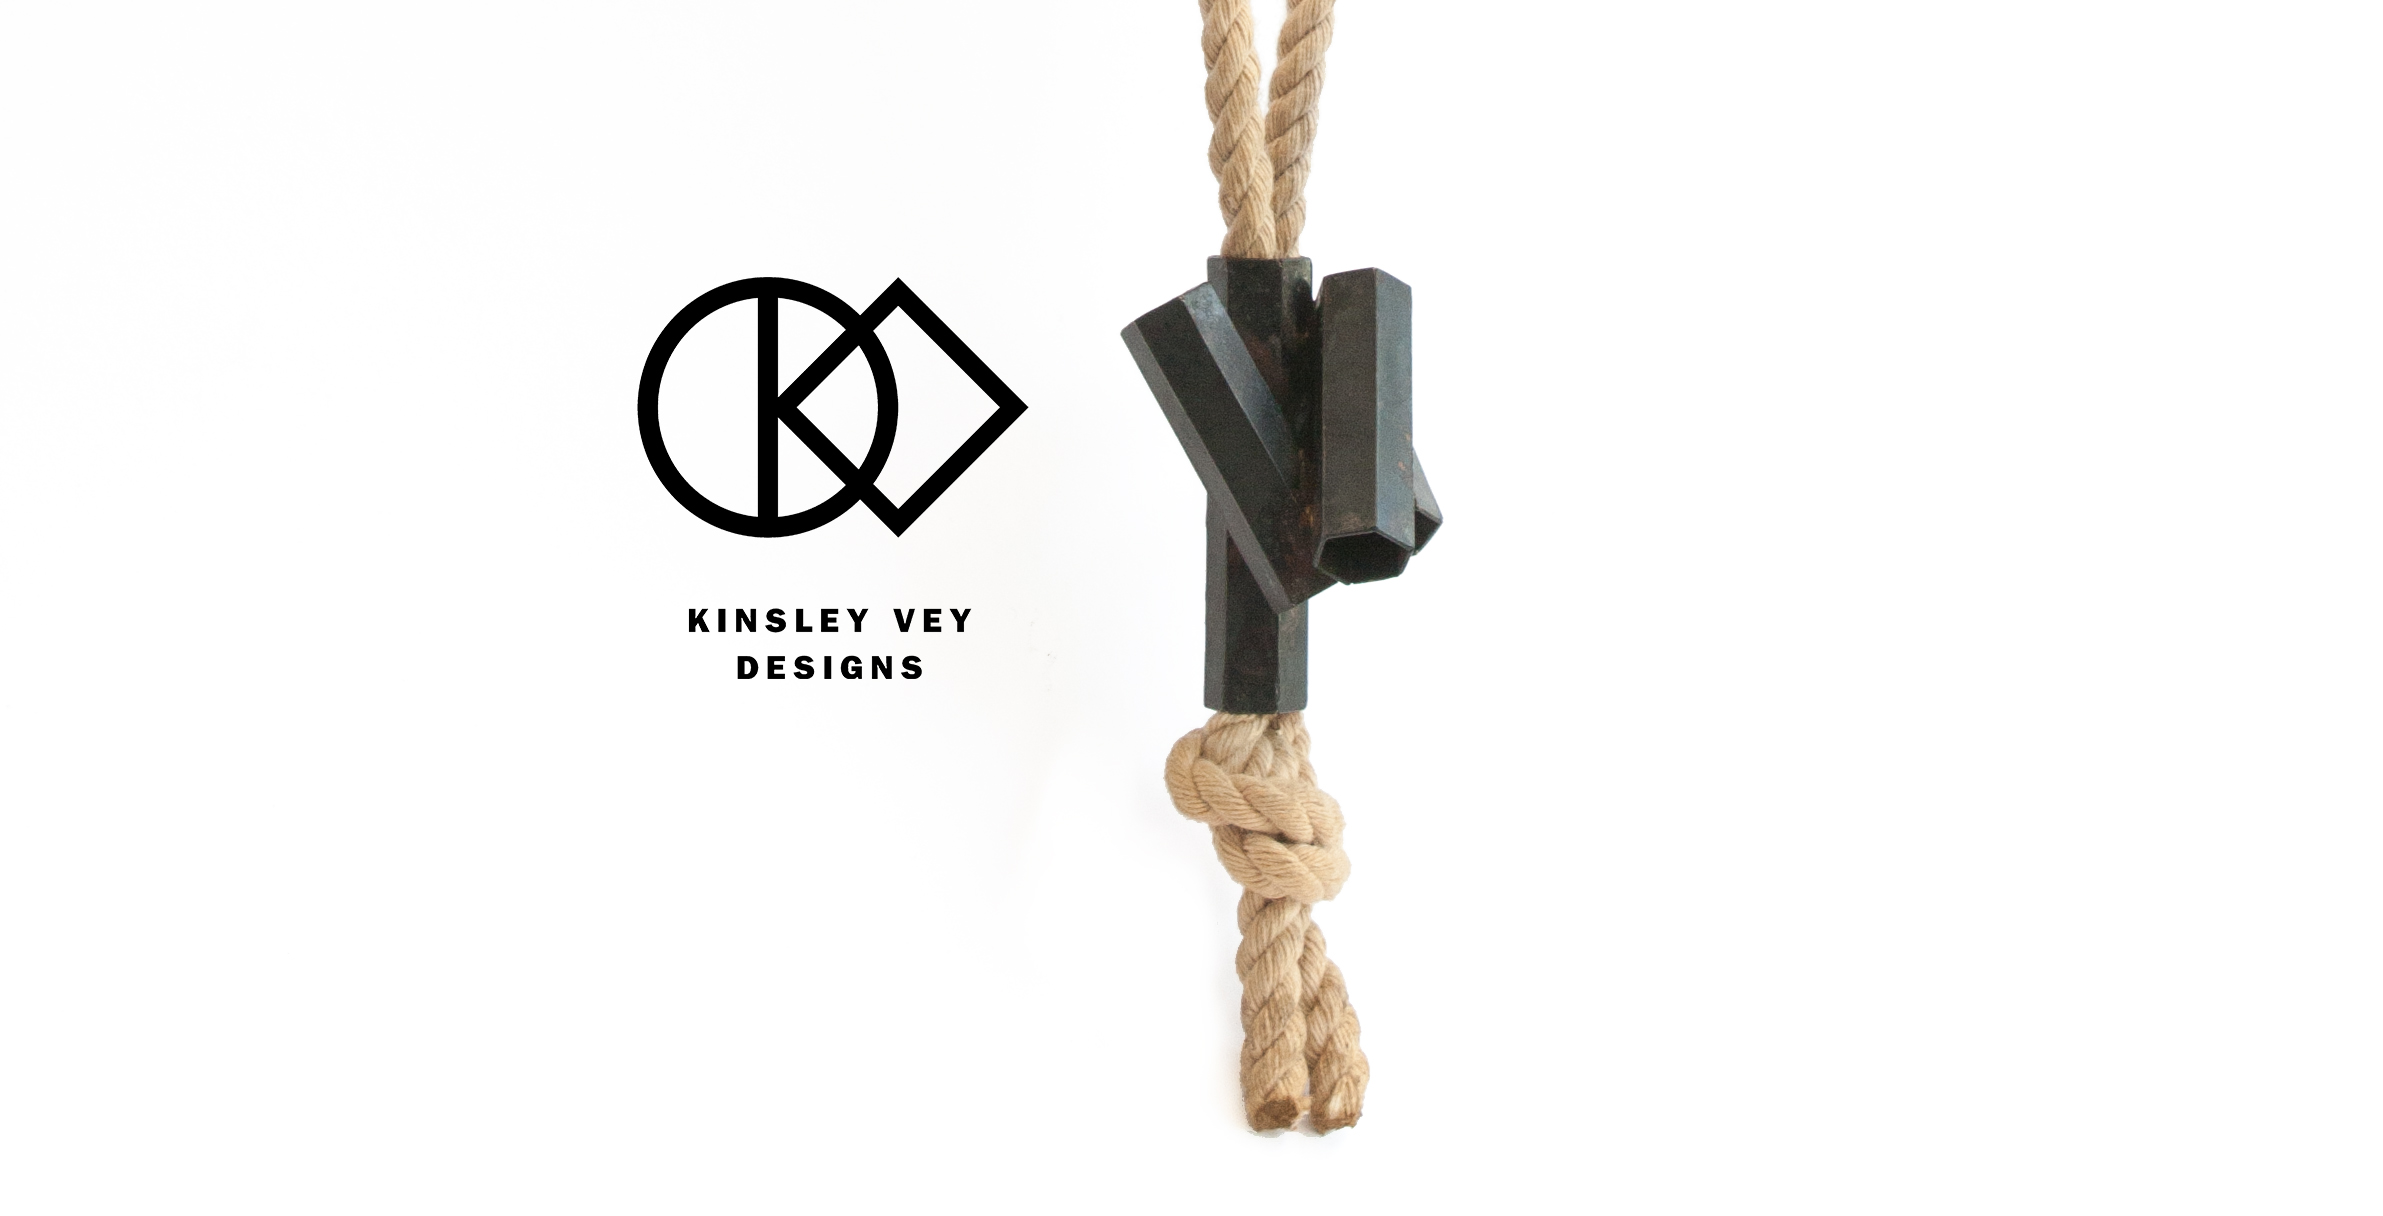 Kinsley Vey Designs